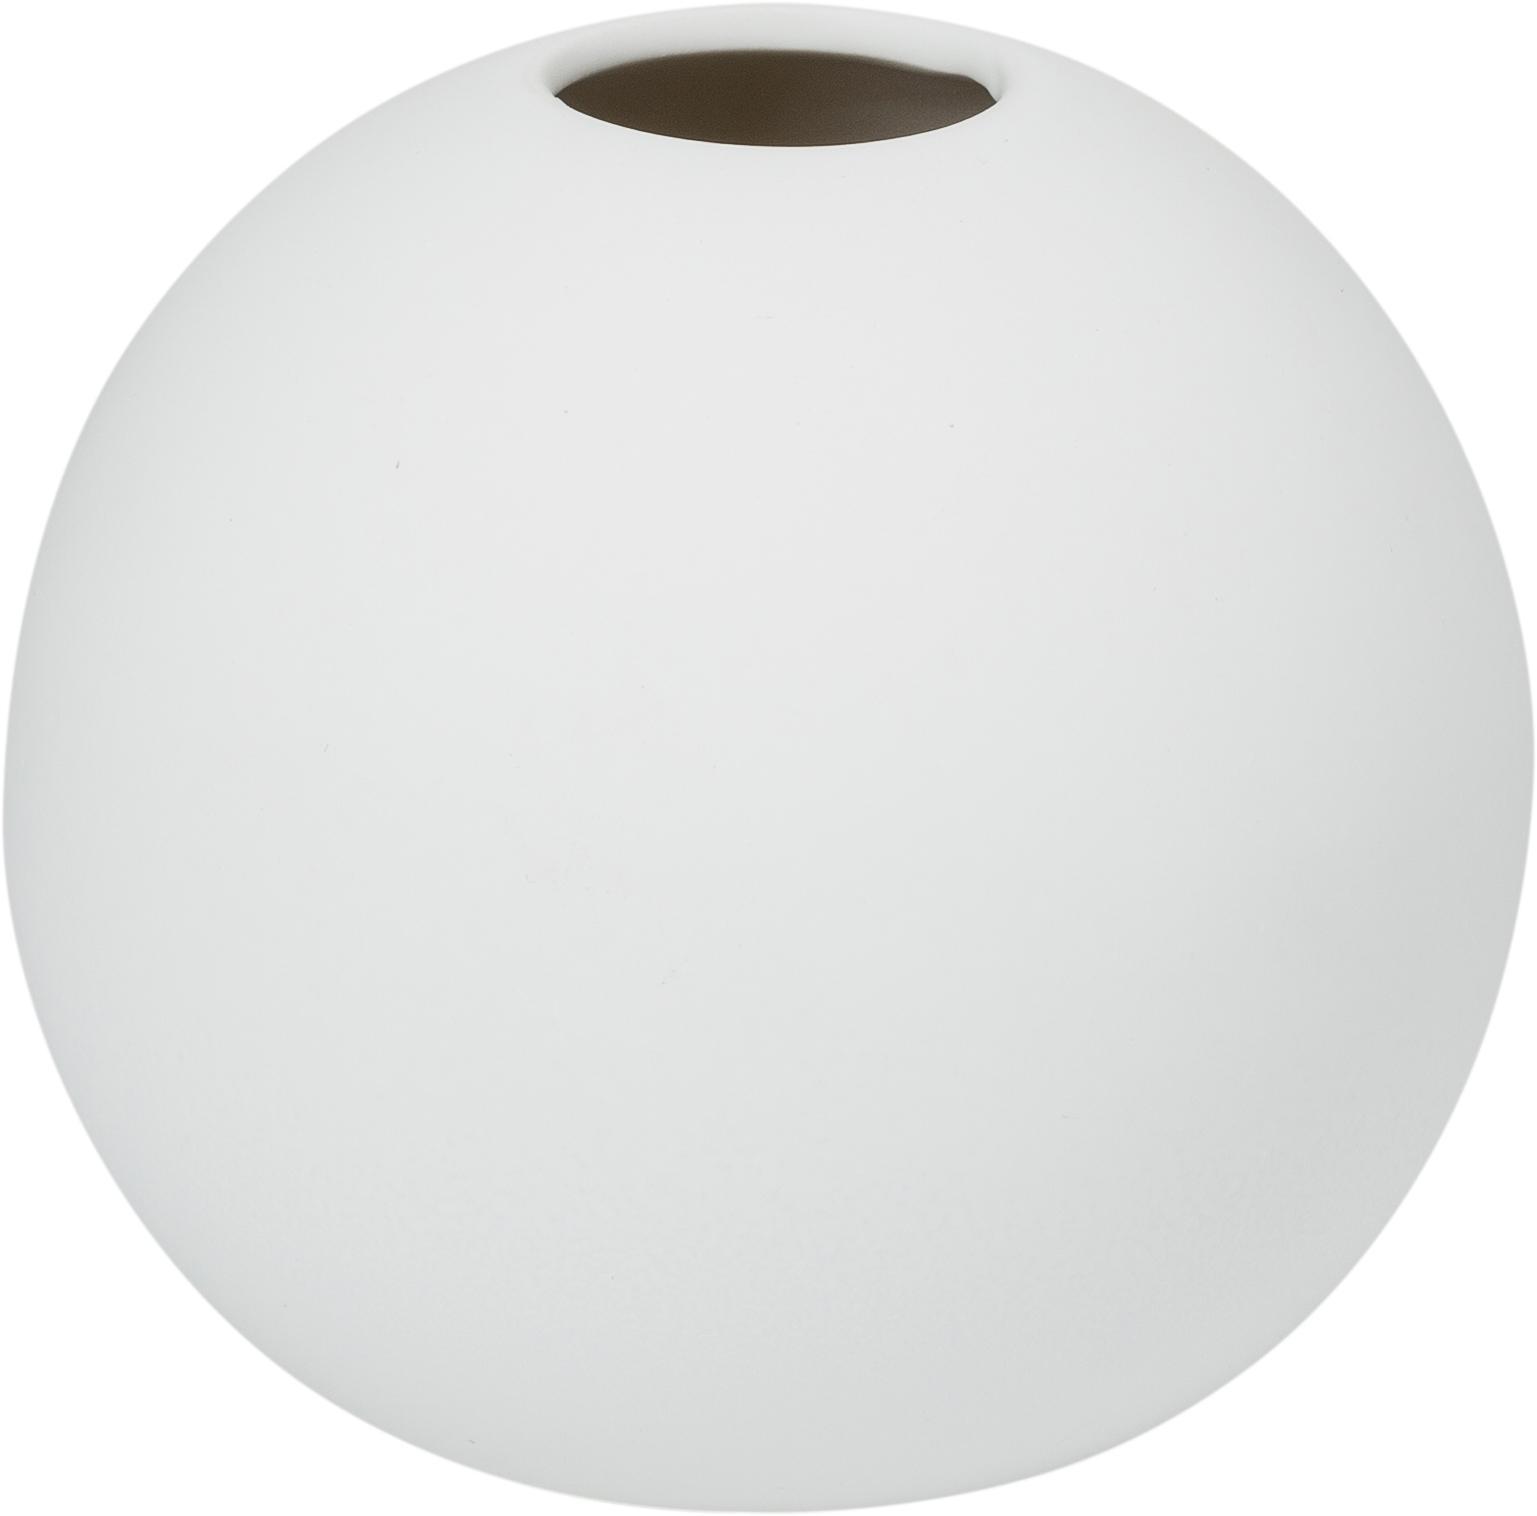 Handgefertigte Kugel-Vase Ball, Keramik, Weiss, Ø 10 x H 10 cm